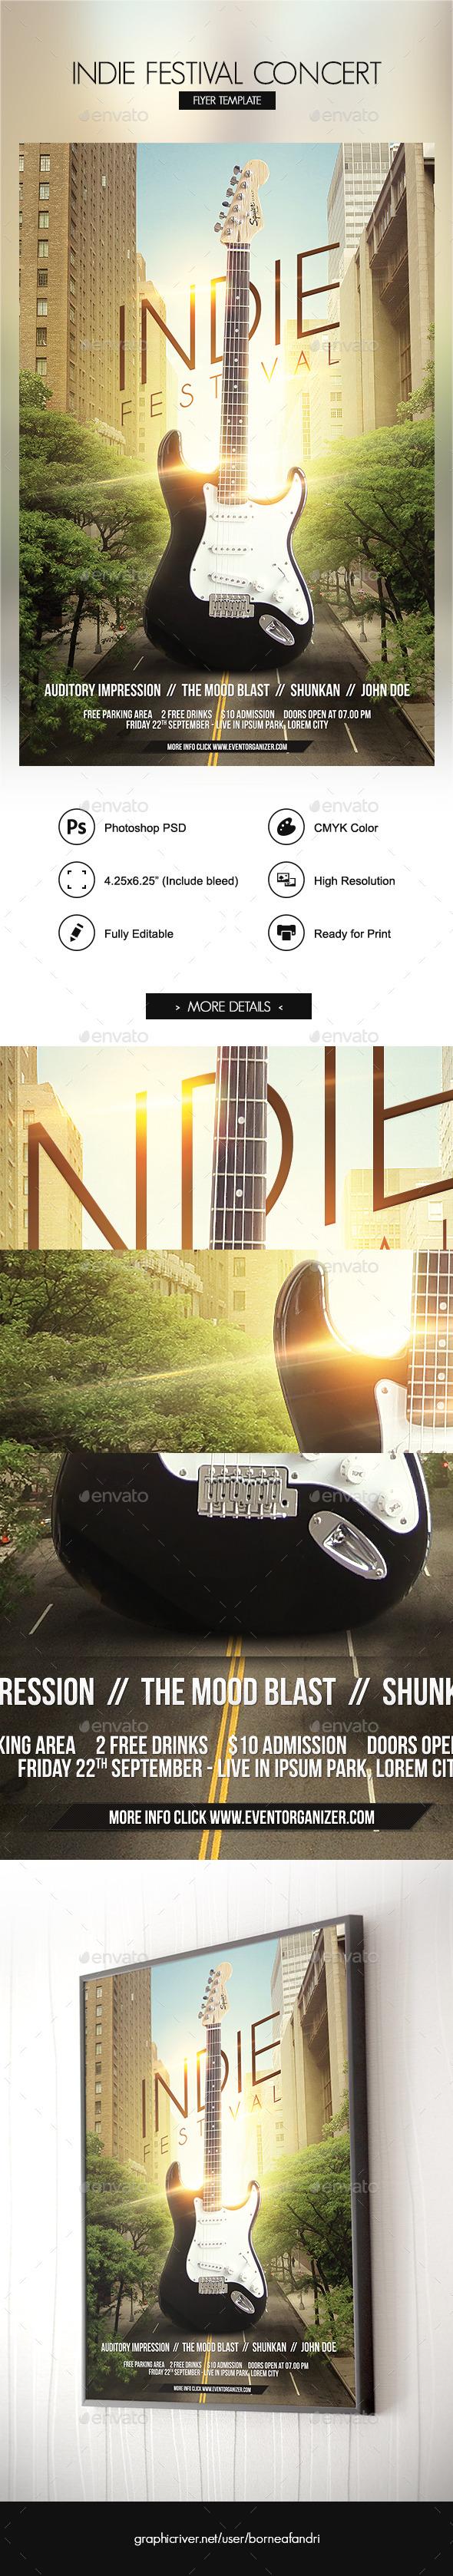 Indie Festival Concert Flyer - Concerts Events